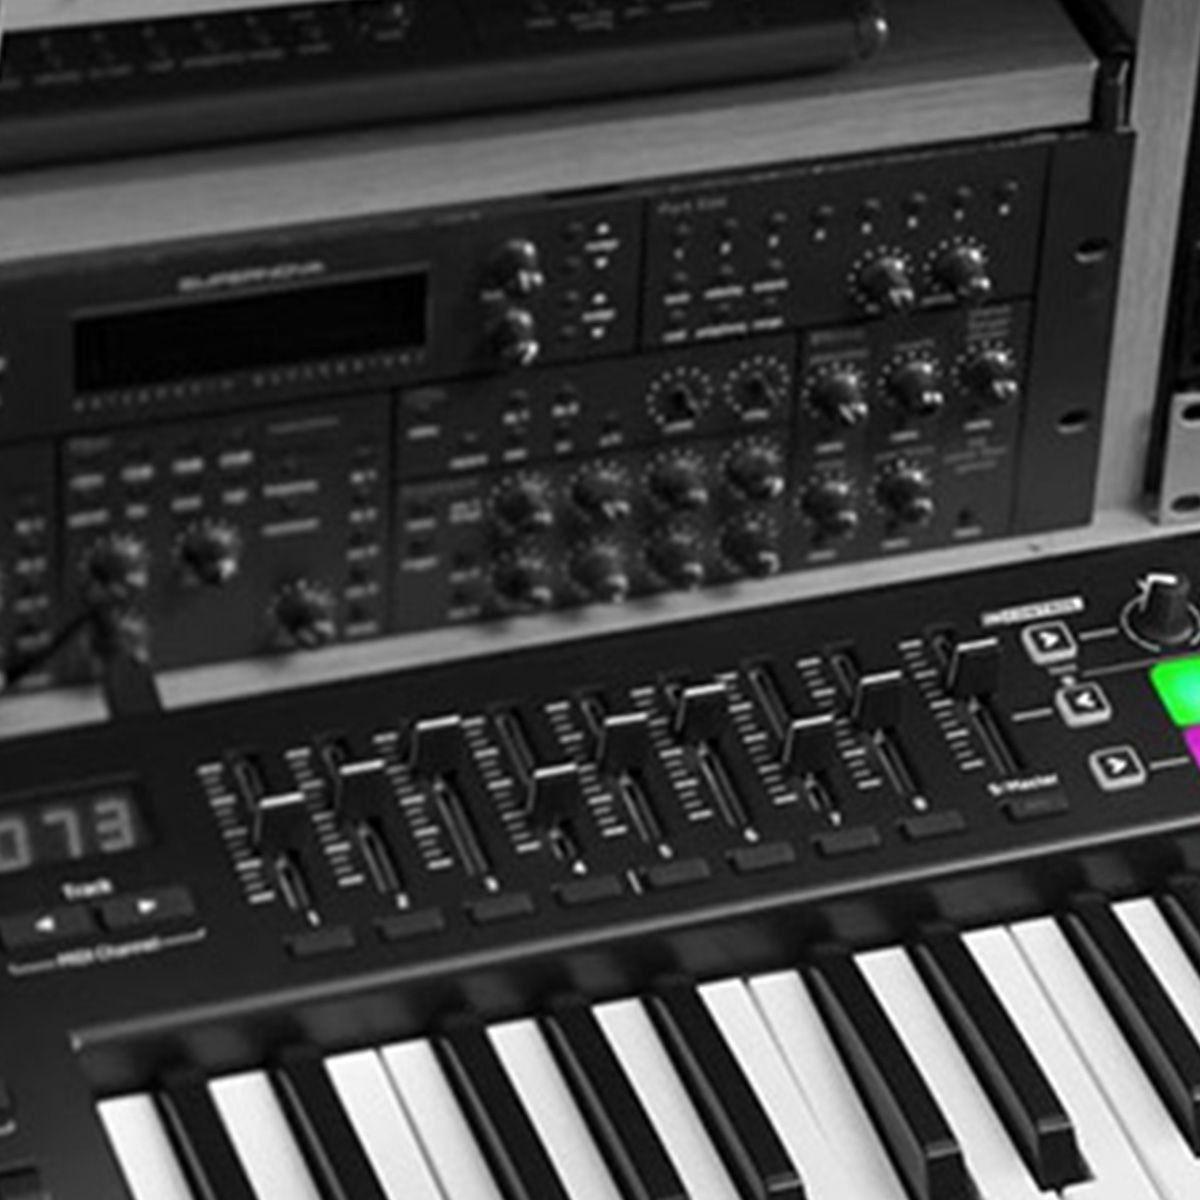 Novation Launchkey 49 MK2 Controladora Midi Usb Profissional para DJ e Produtores